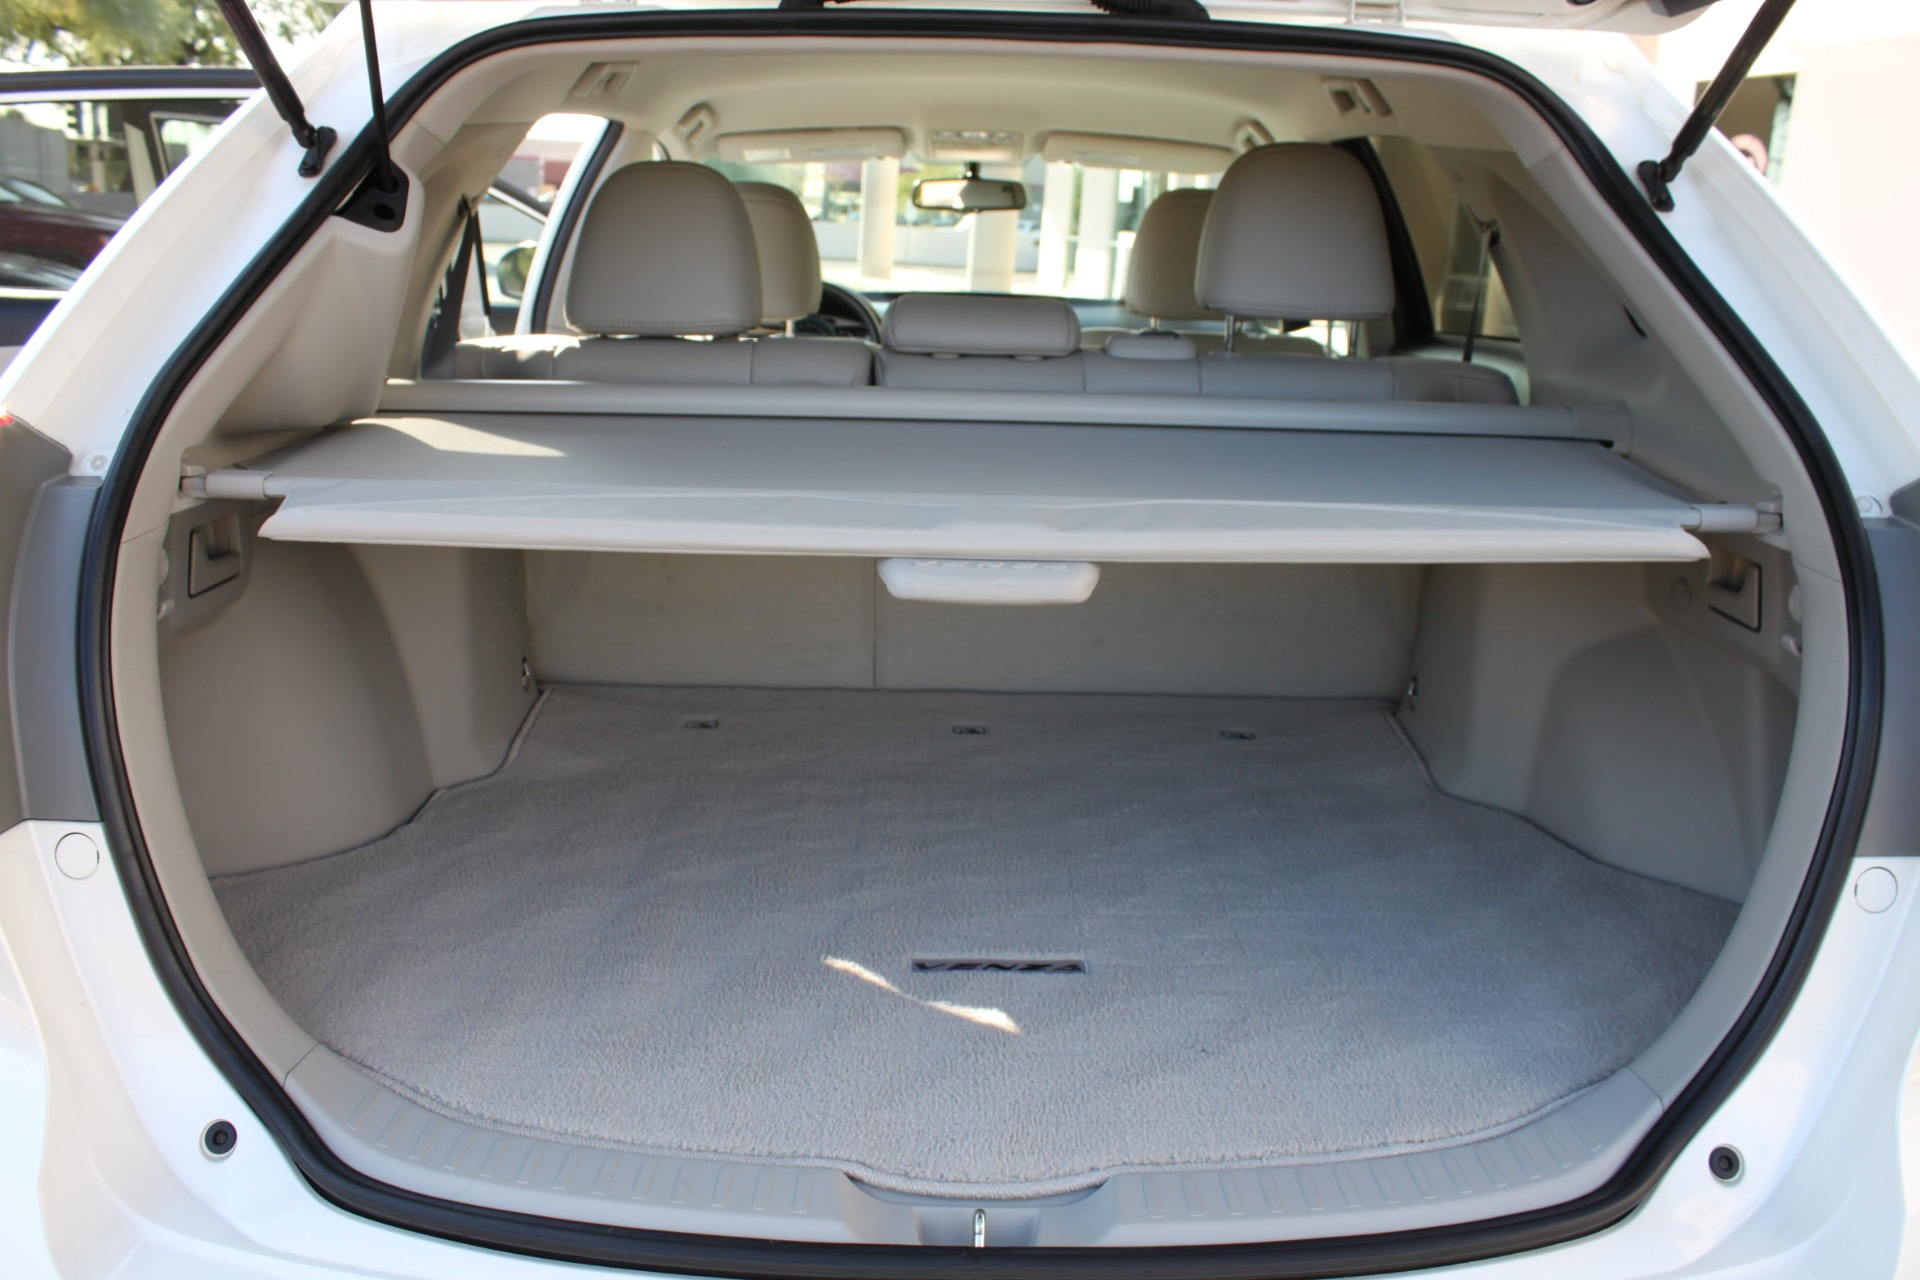 Used-2012-Toyota-Venza-XLE-Chevrolet